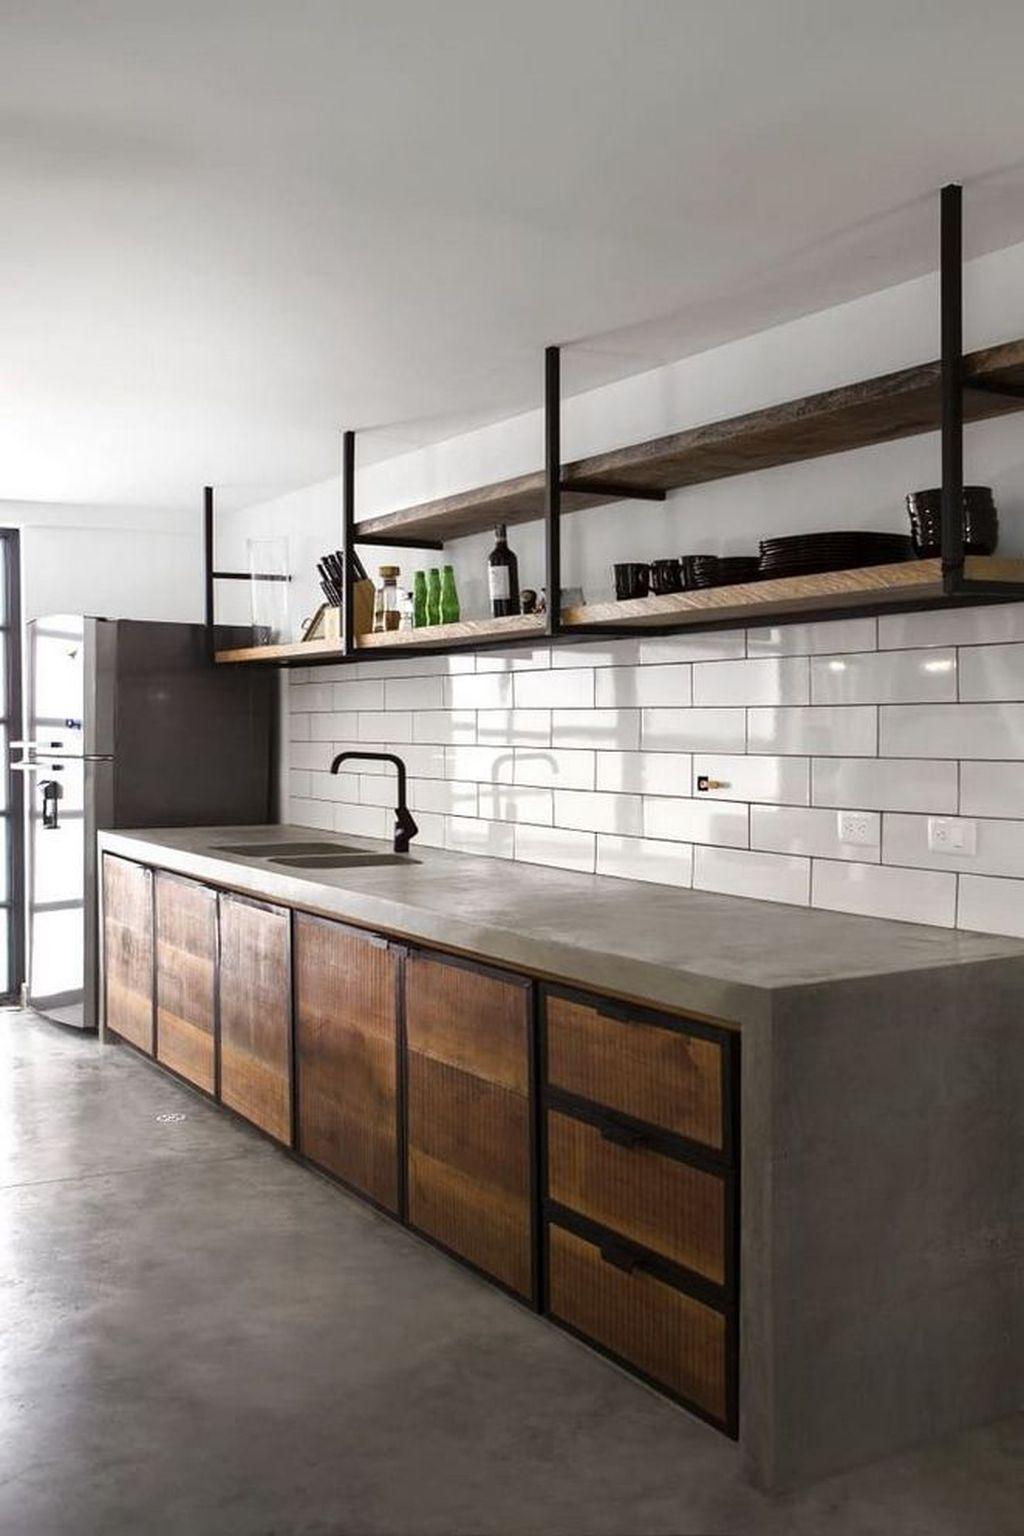 45 Simple Metal Kitchen Design In 2020 Industrial Kitchen Design Industrial Livingroom Industrial Interior Design